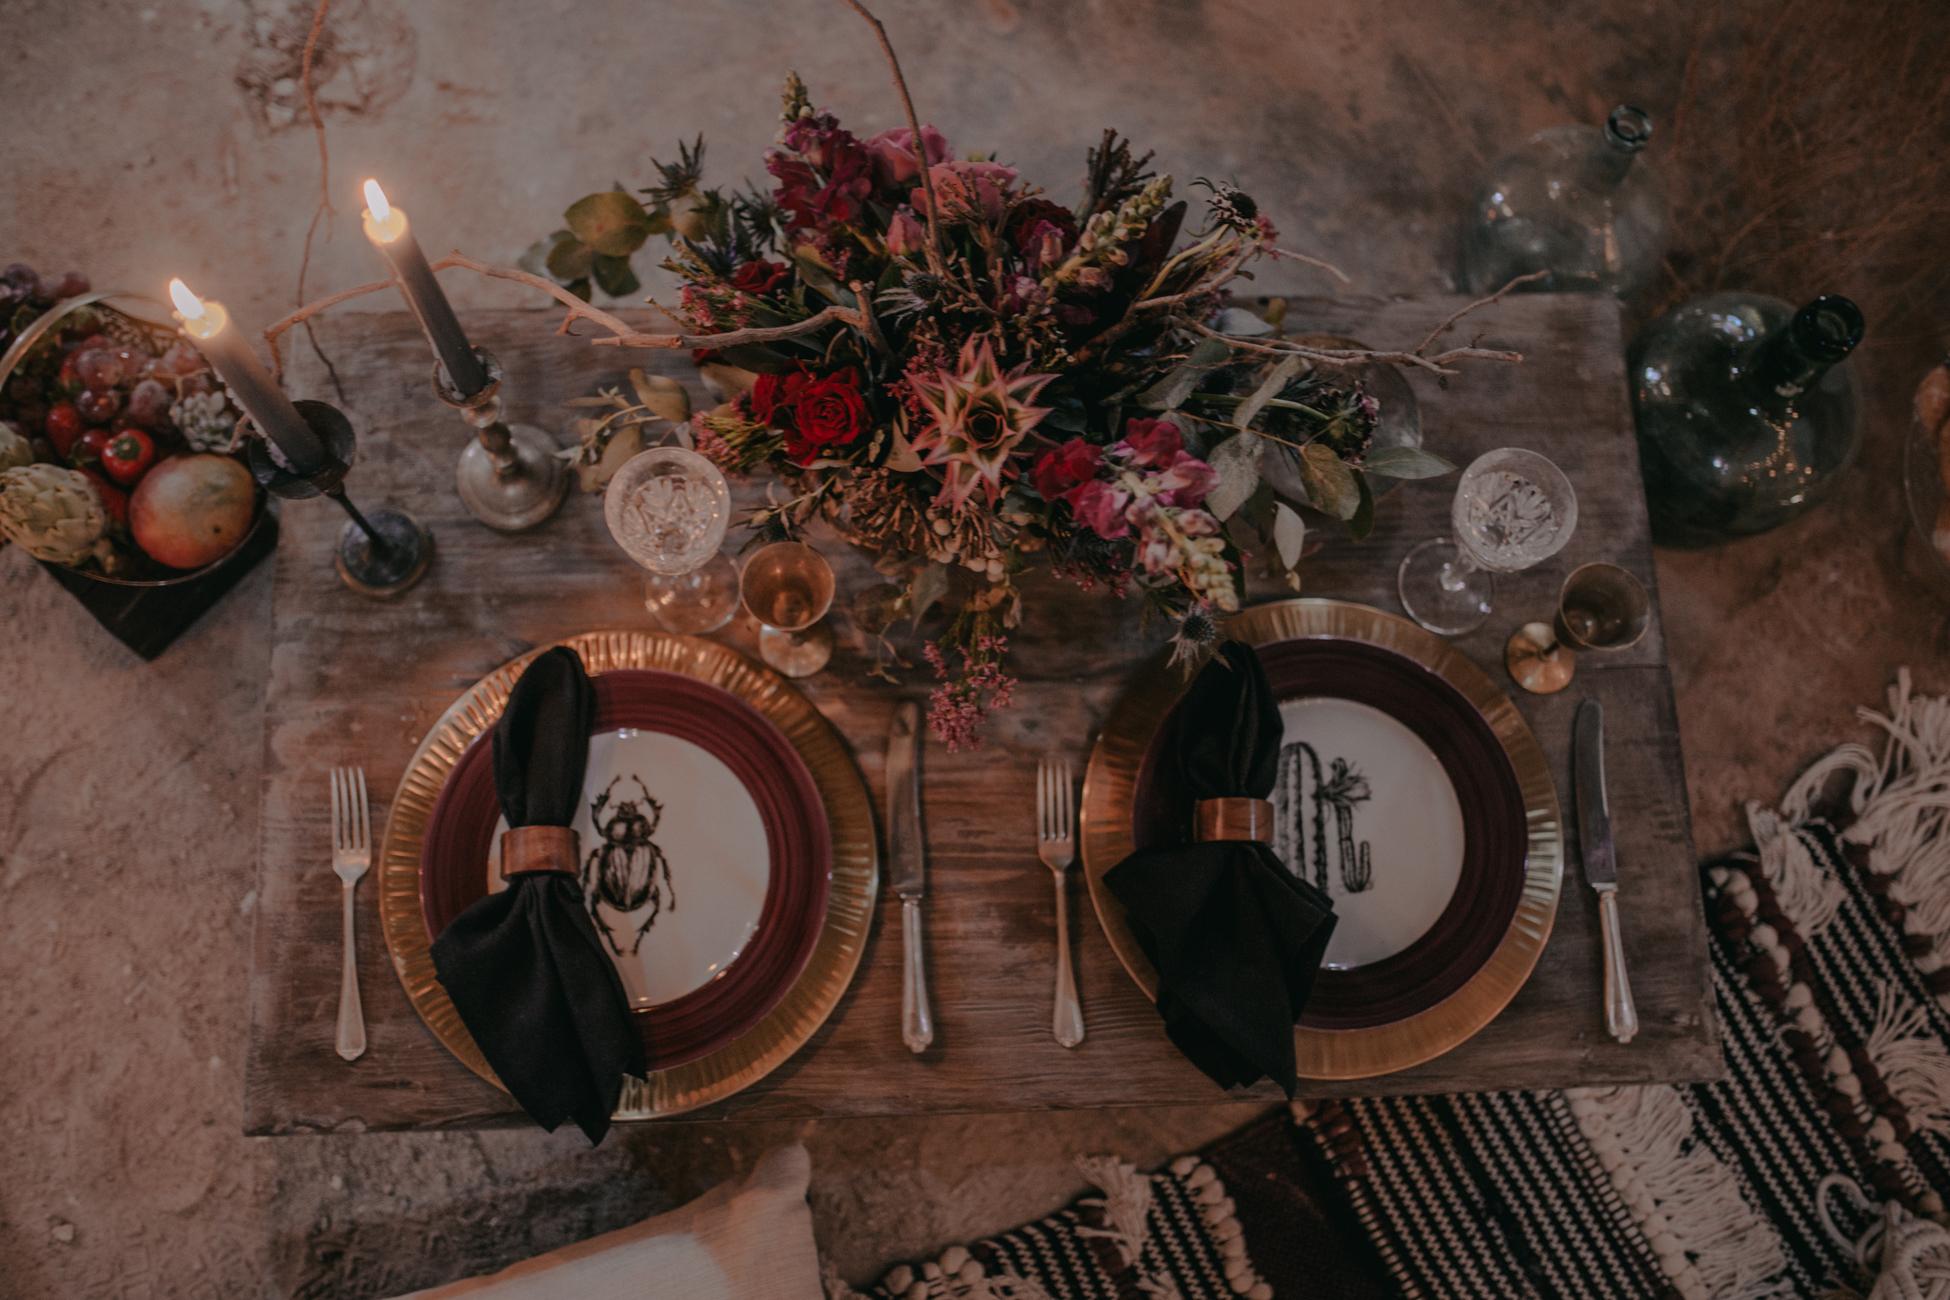 thenortherngirlphotography_photography_thenortherngirl_rebeccascabros_wedding_weddingphotography_weddingphotographer_wood_muebles_deco_bodasdecaramelo_home_bedtime_gaywedding_editorial_desierto_desert_wildestdreams_amortexano-24.jpg